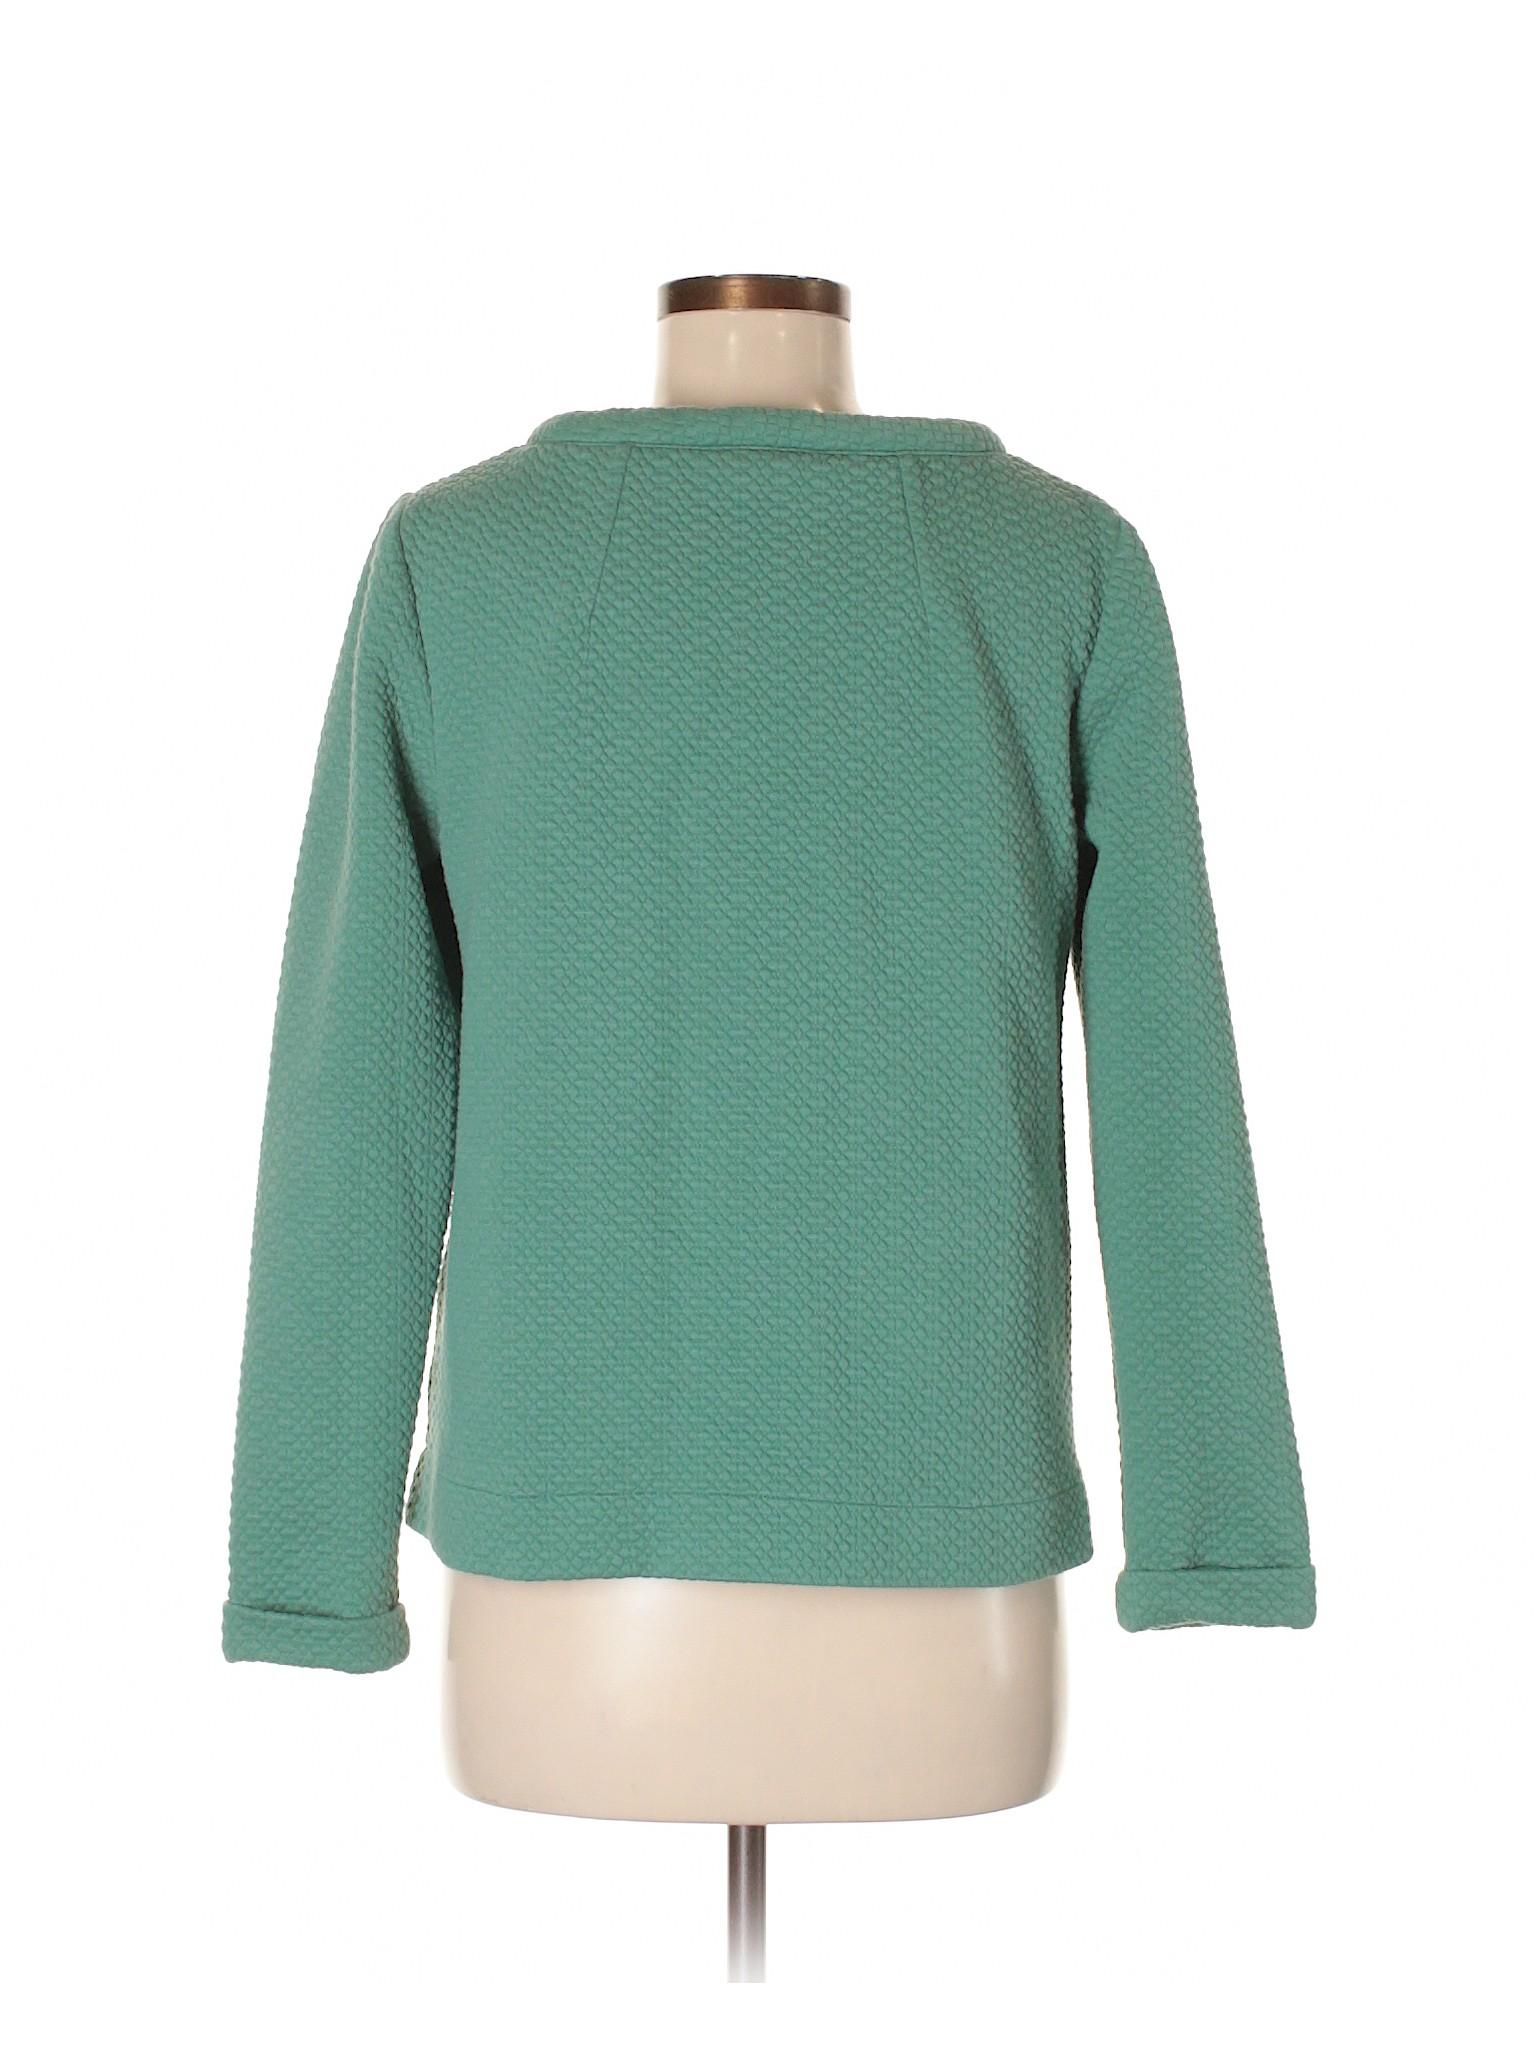 Sweater Boutique Boutique Boden Sweater Pullover Boutique winter Boden Pullover Sweater Boden winter Pullover winter qttrA